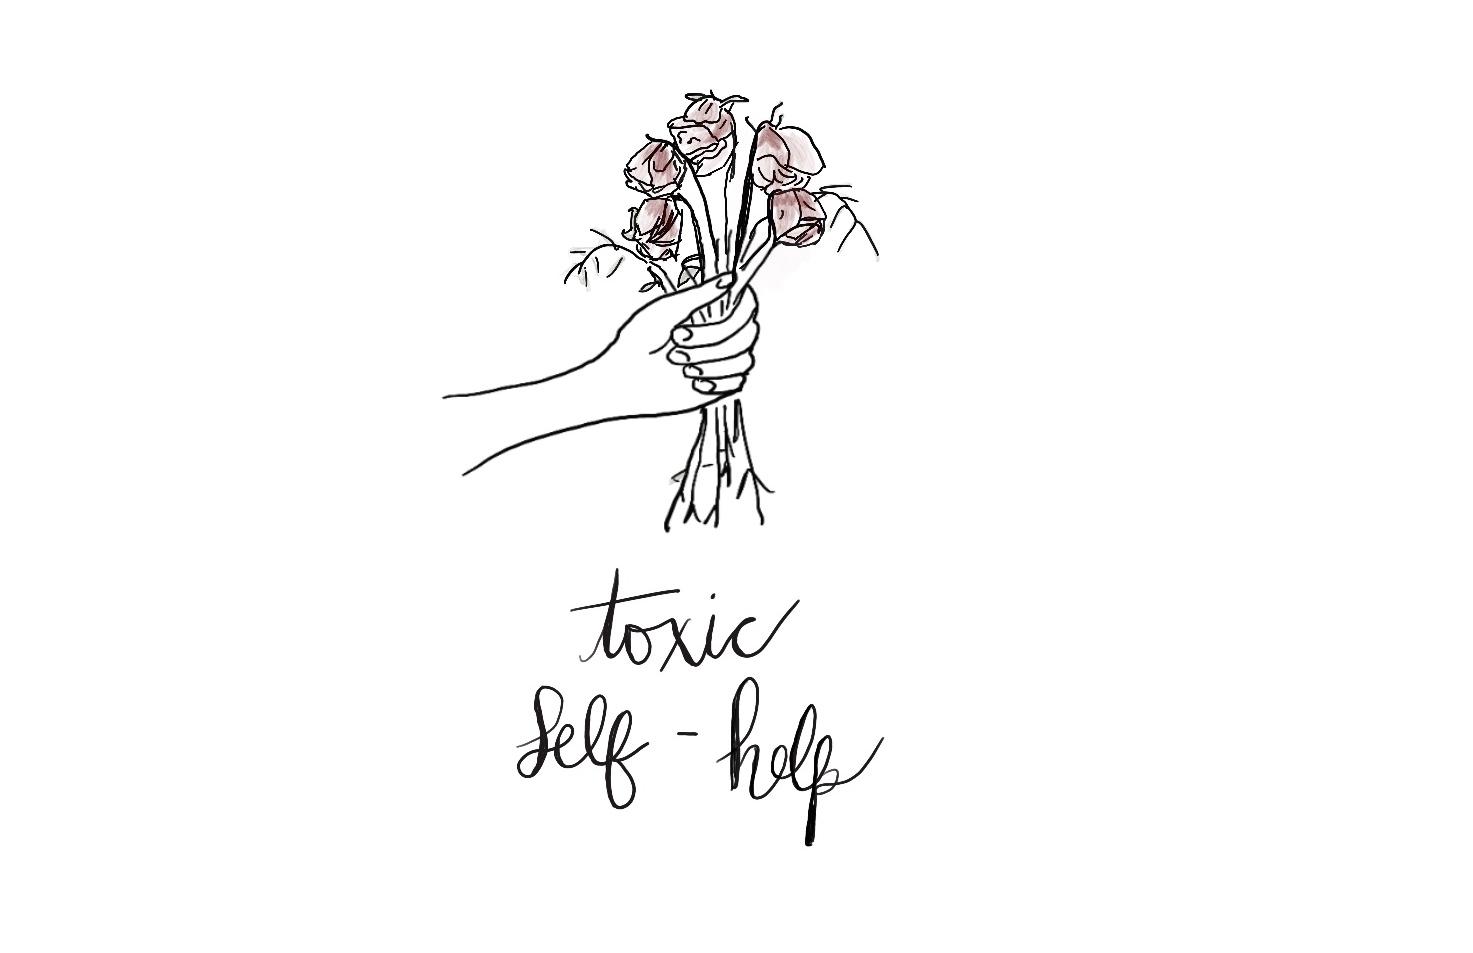 Toxic-Self-help.jpg